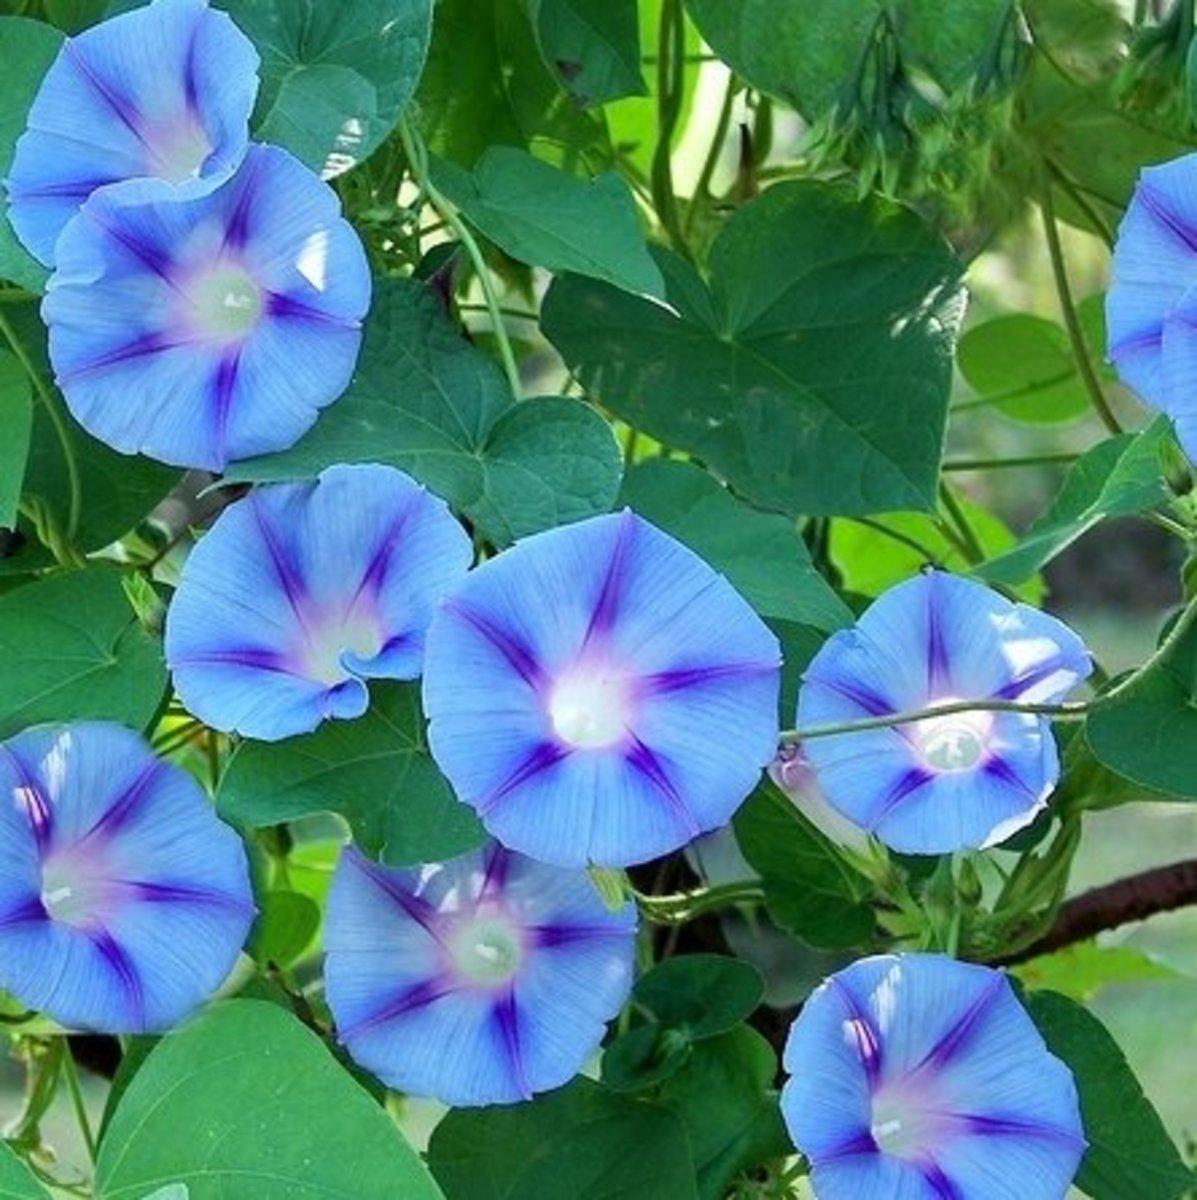 Ipomoea purpurea common morning glory tips and legends for Ipomea purpurea